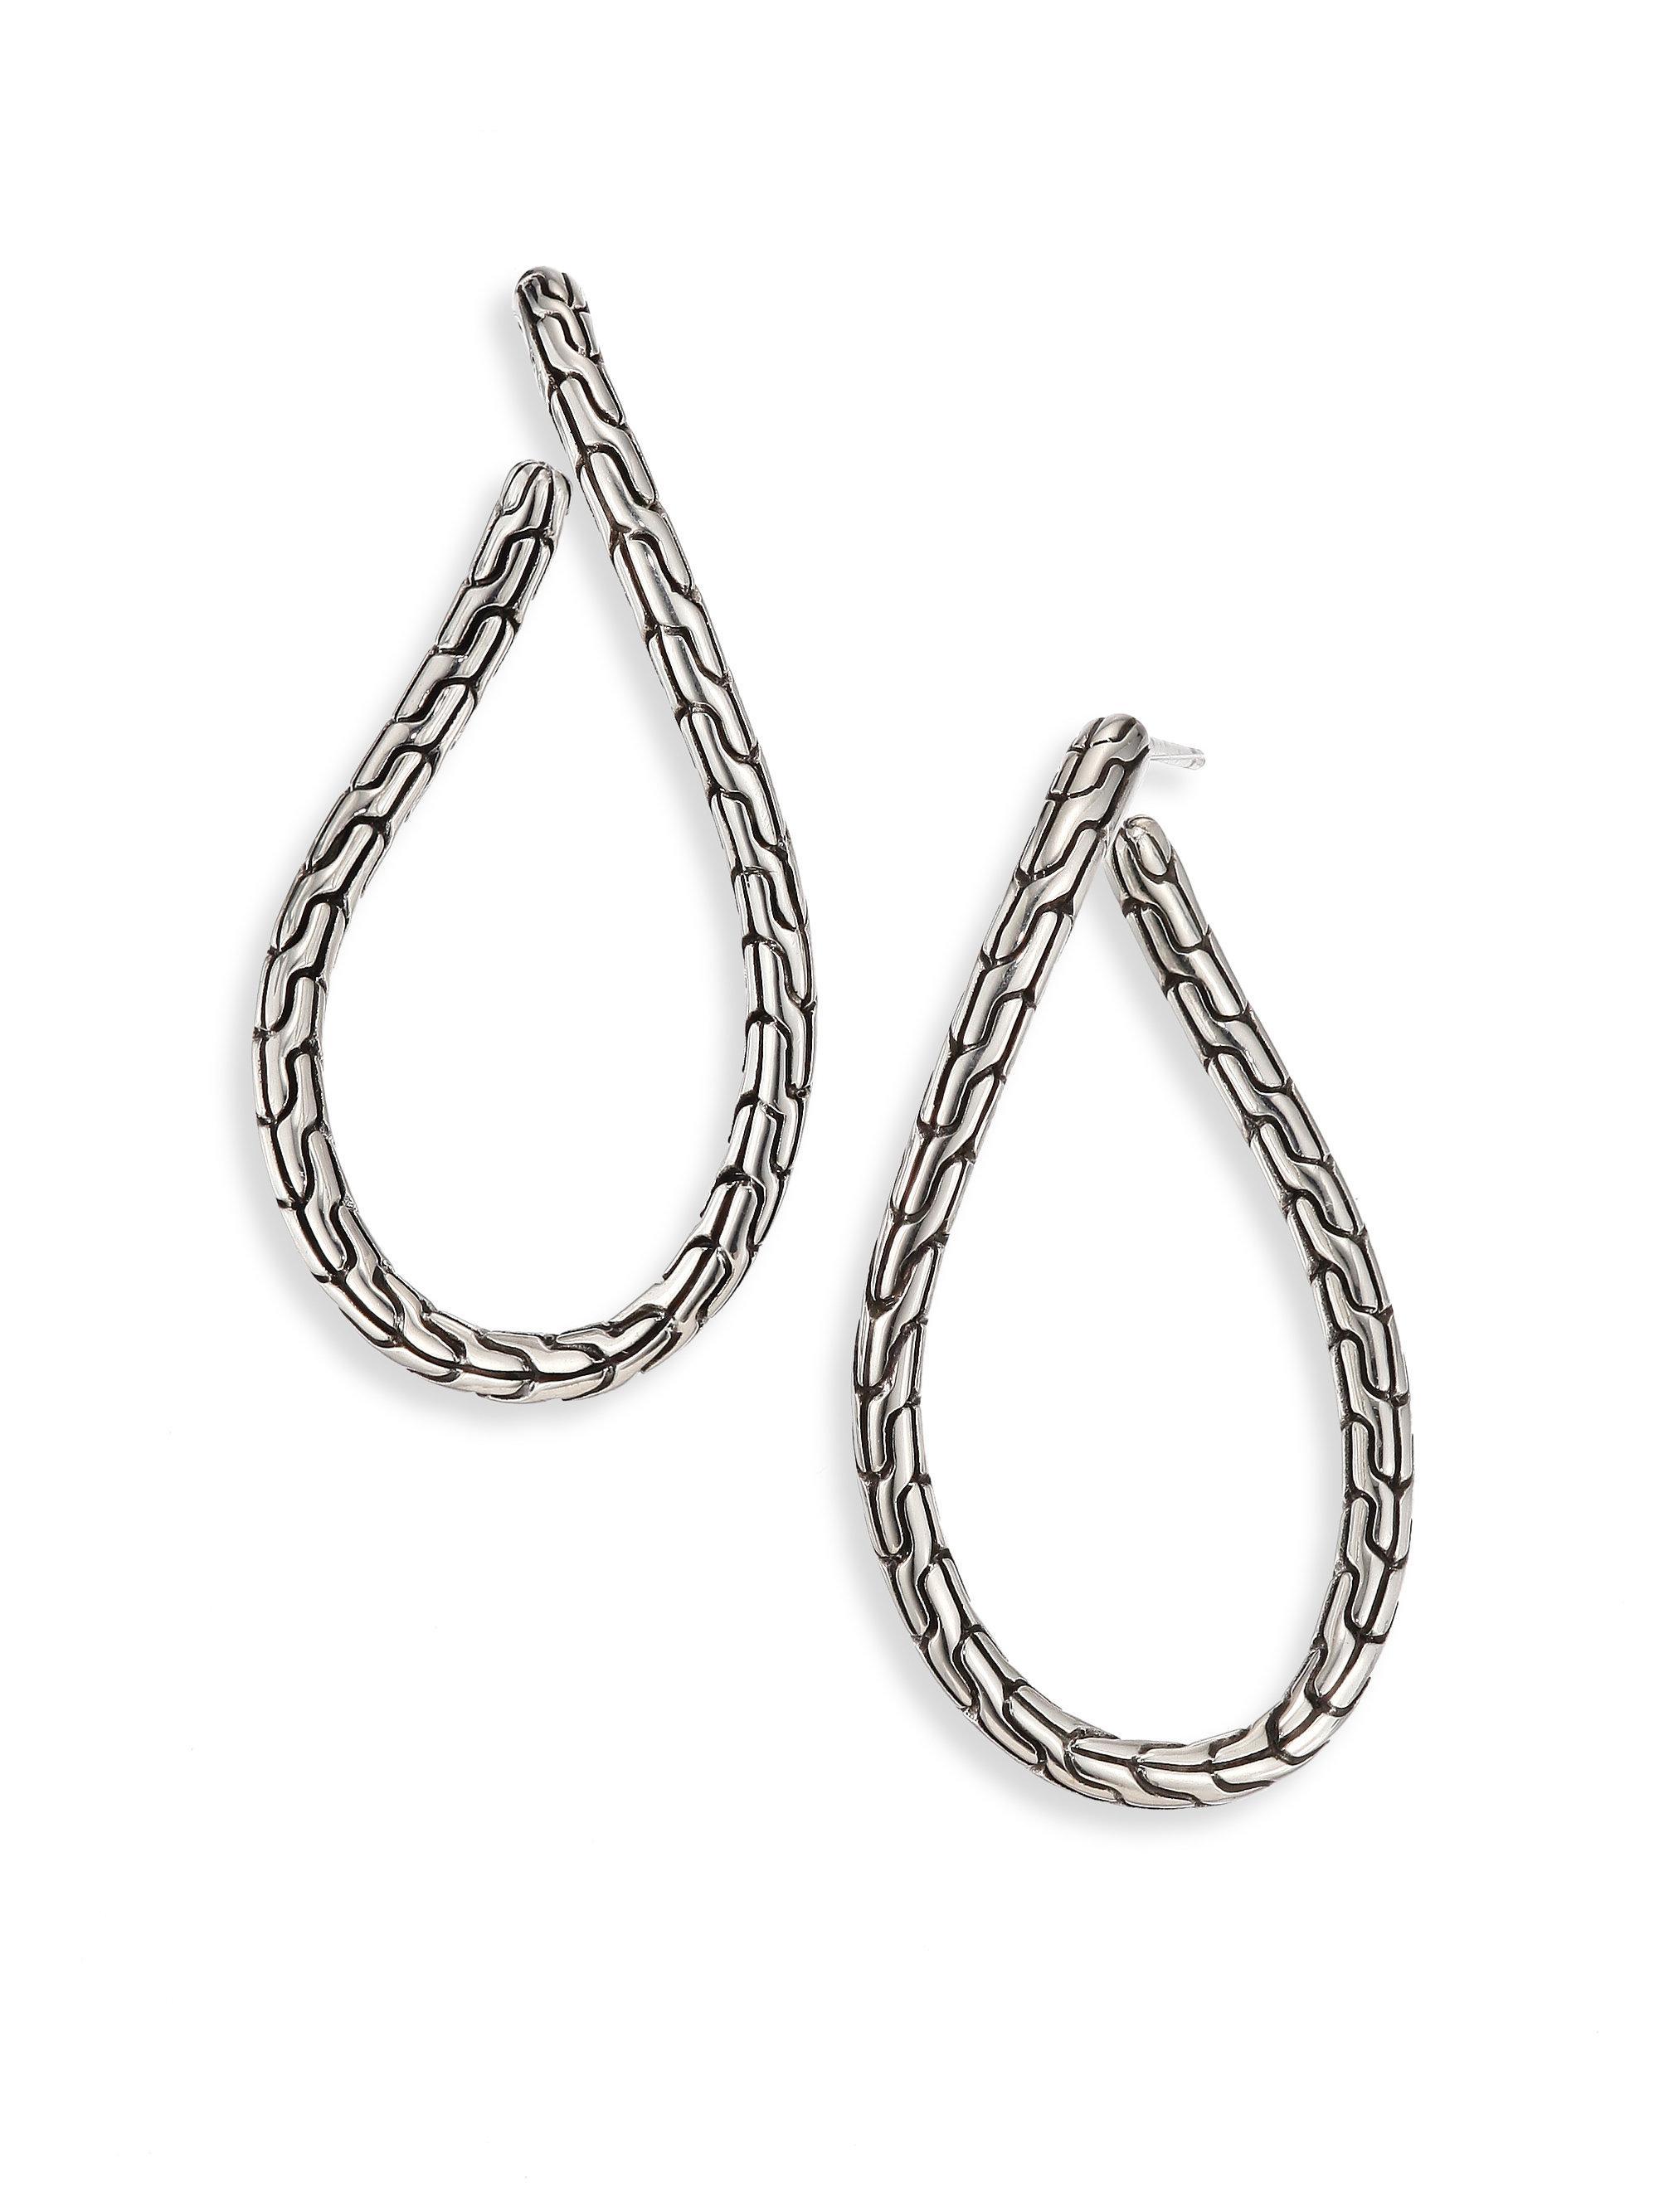 John Hardy Classic Chain Sterling Silver Twisted Hoop Earrings WRweS3